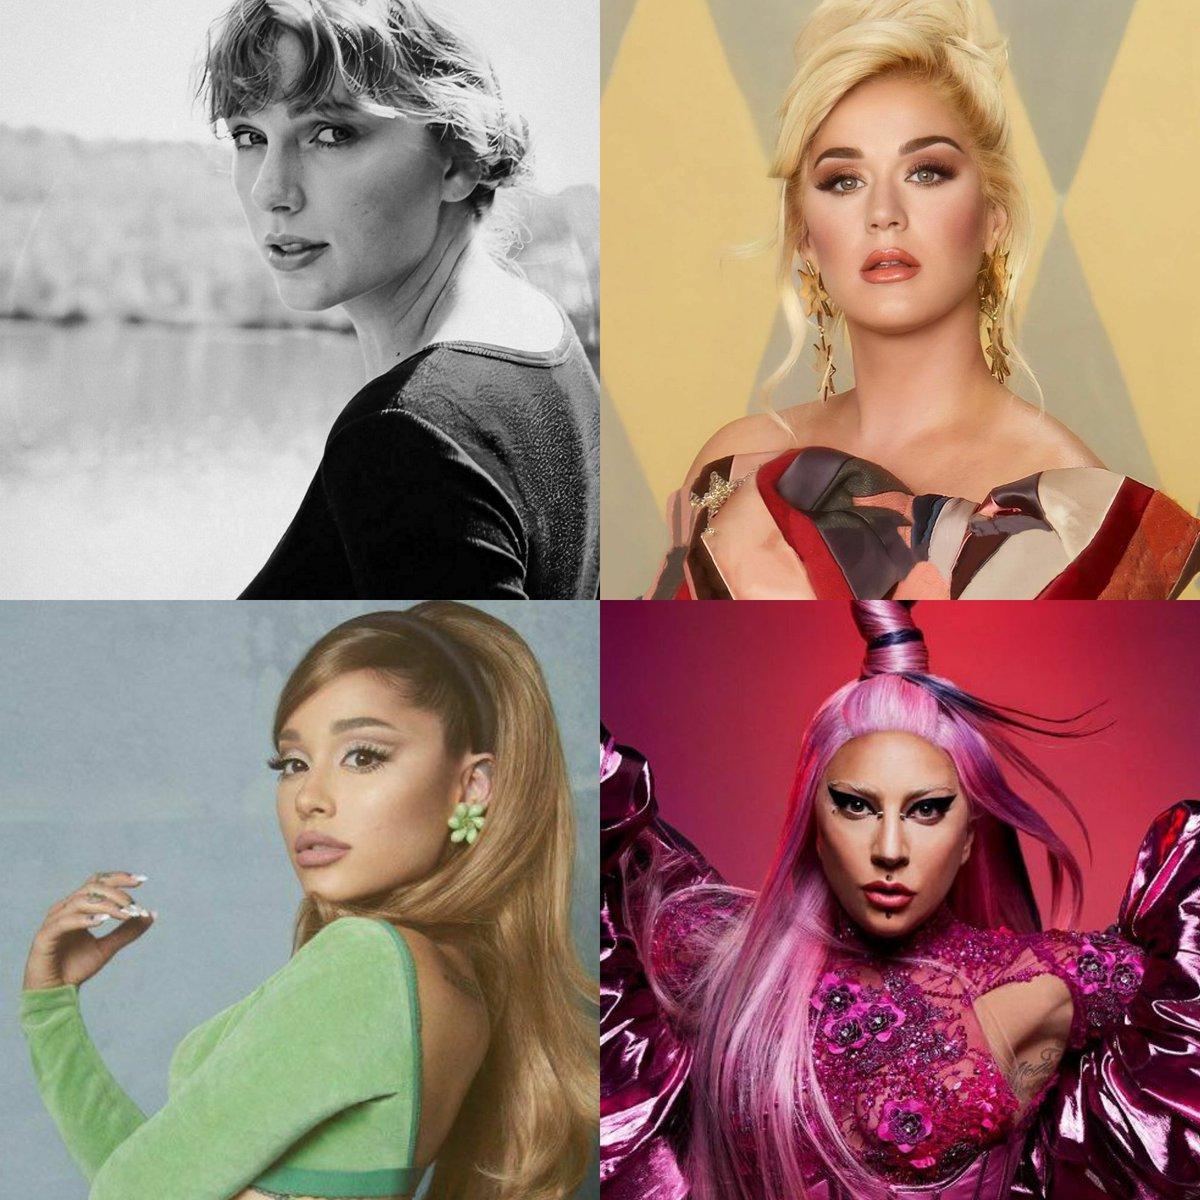 Cantoras mais influentes no Twitter em 2020, segundo a empresa Brandwatch:  #1. Taylor Swift  #2. Katy Perry  #3. Ariana Grande  #4. Lady Gaga  #5. Jennifer Lopez #6. Miley Cyrus  #7. Rihanna  #8. Selena Gomez  #9. Shakira  #10. Mariah Carey  #11. Demi Lovato  #12. Avril Lavigne